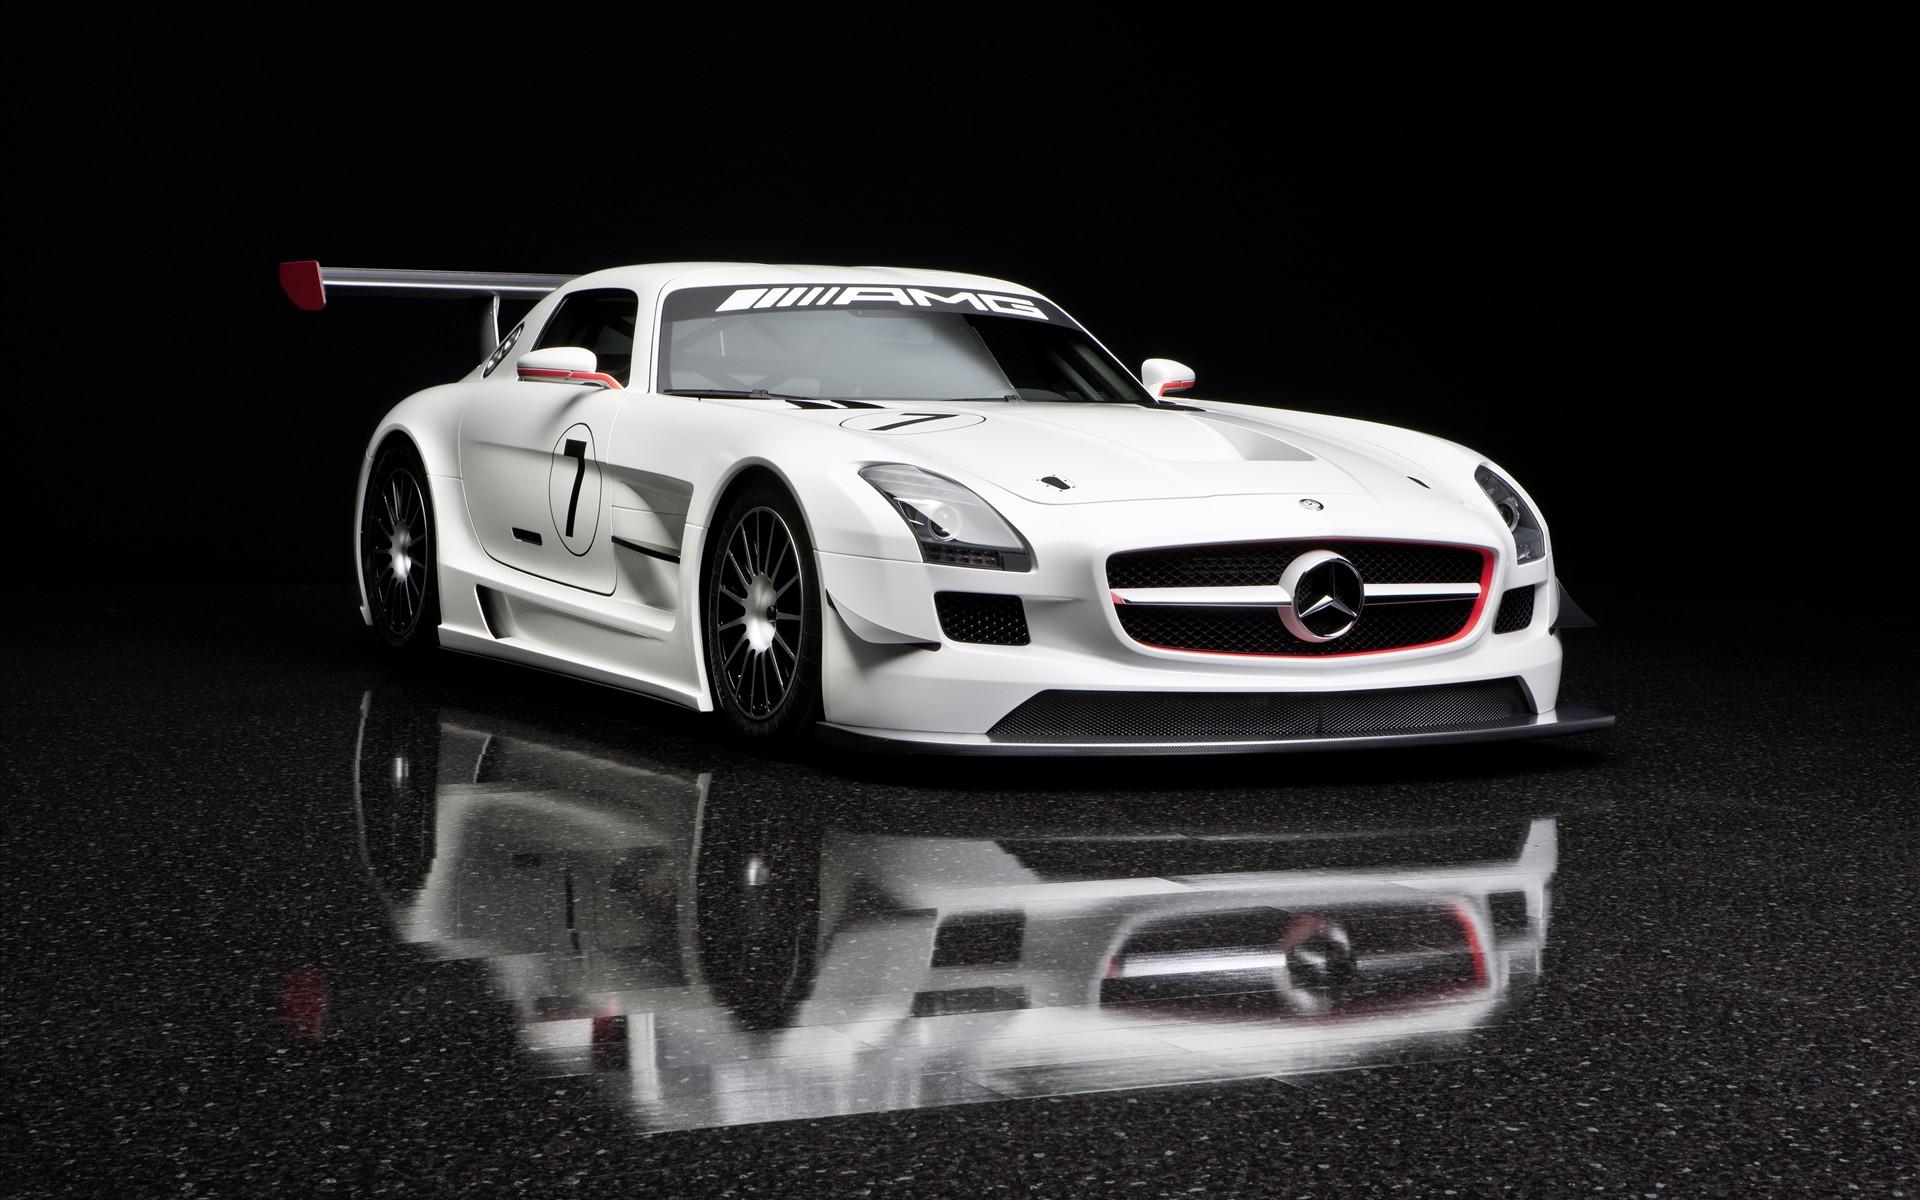 Mercedes Benz Images Mercedes Benz Sls Amg White Hd Wallpaper And